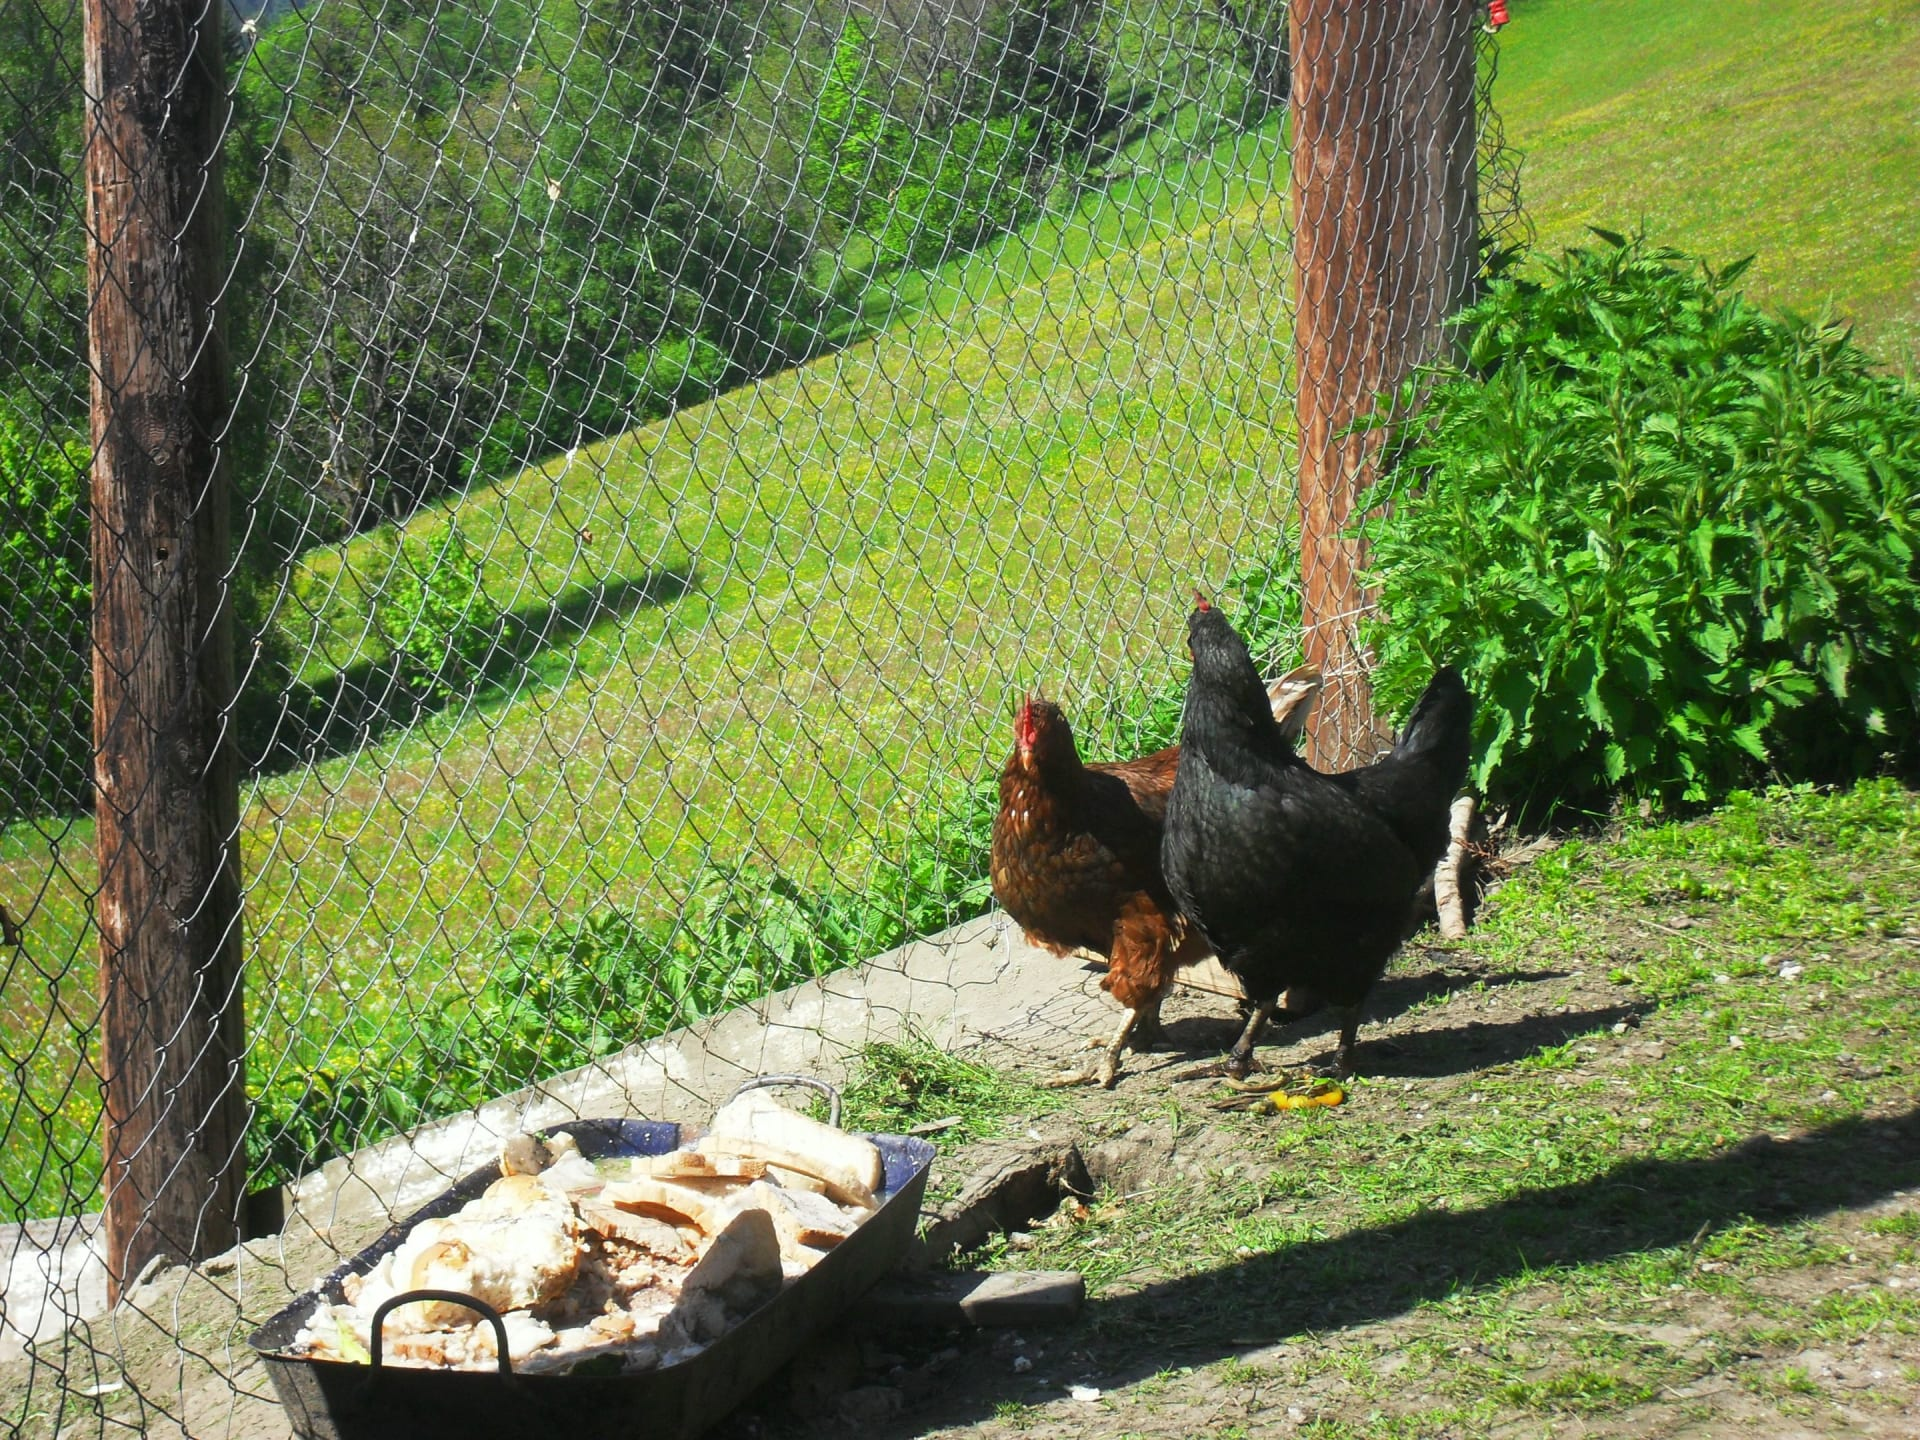 unsere Eierproduzenten